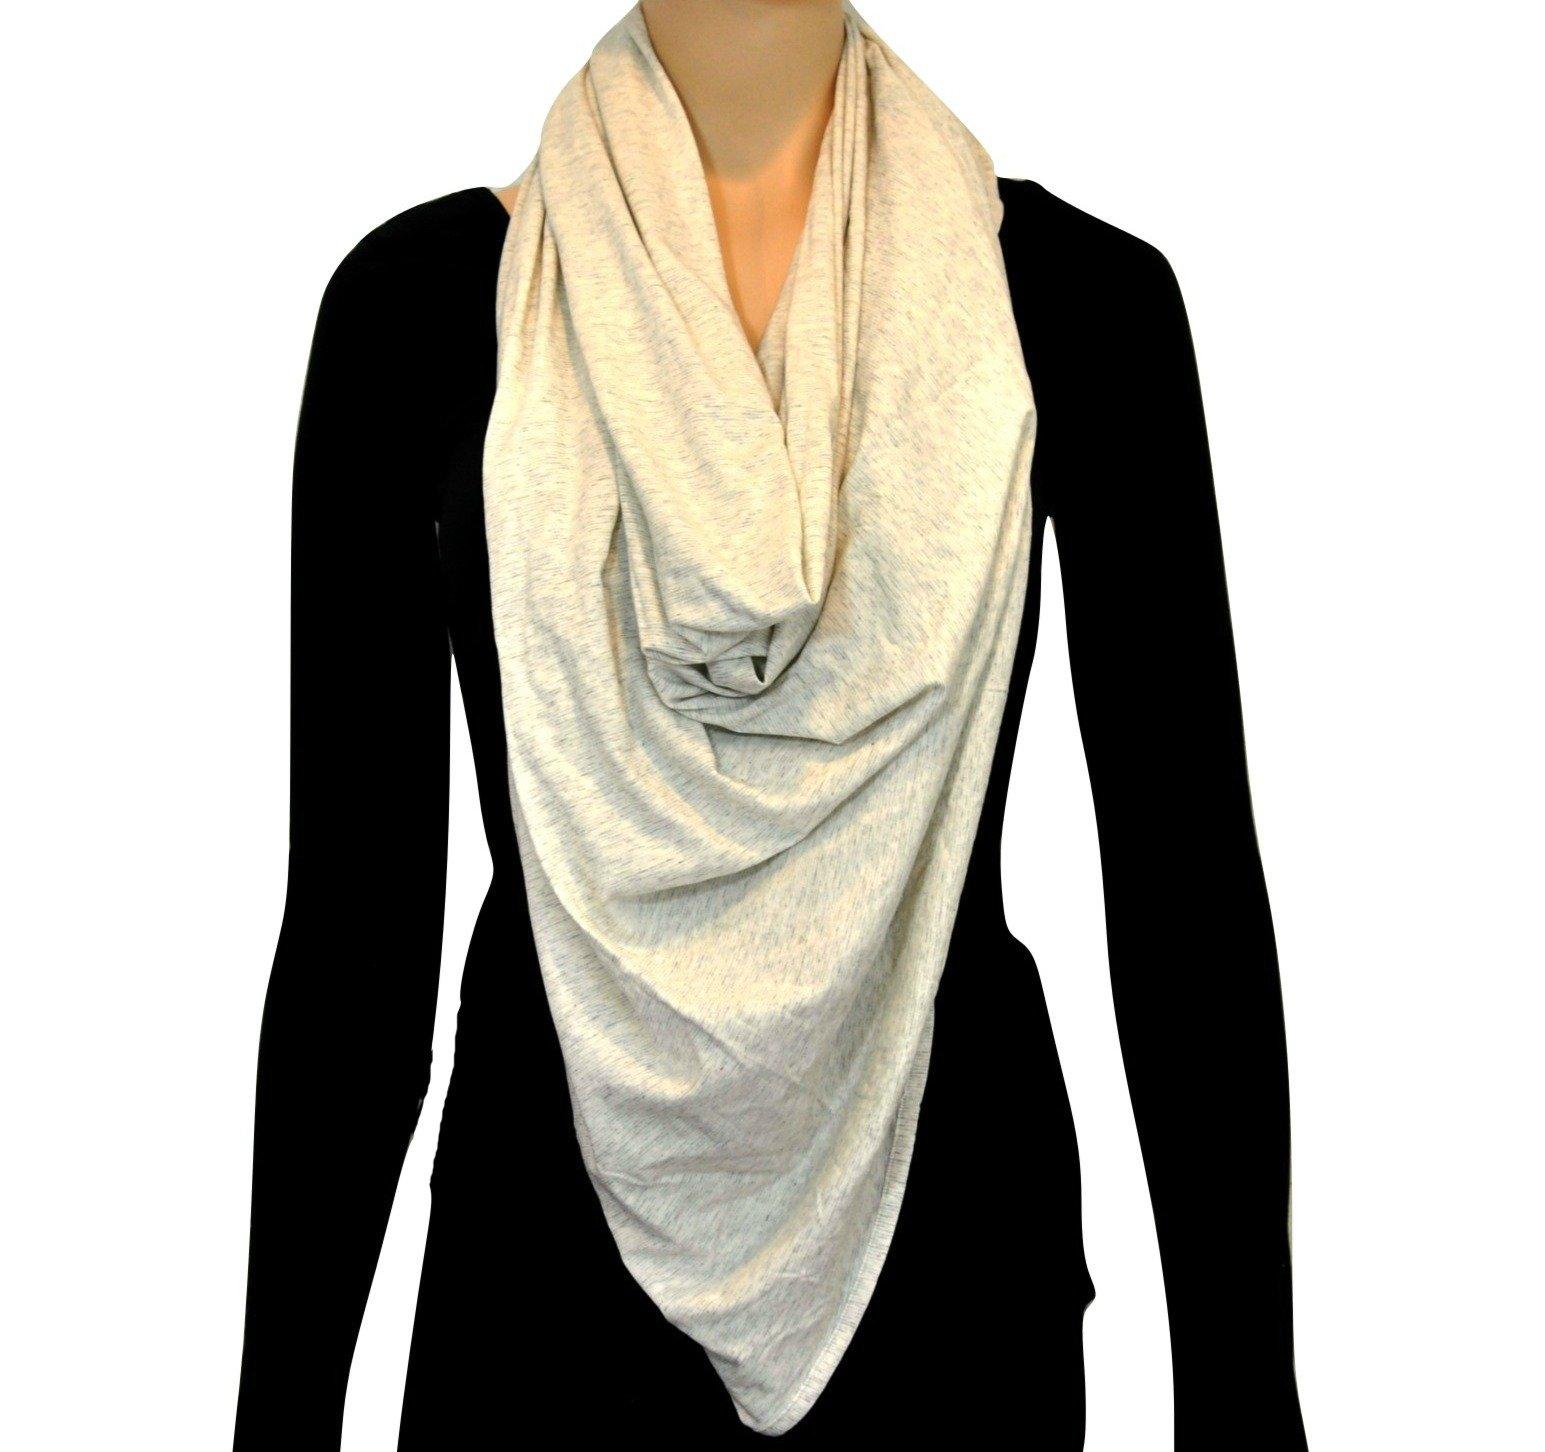 Lululemon Sage Scarf Wrap Cotton (Wee Stripe Heathered Light Grey White)